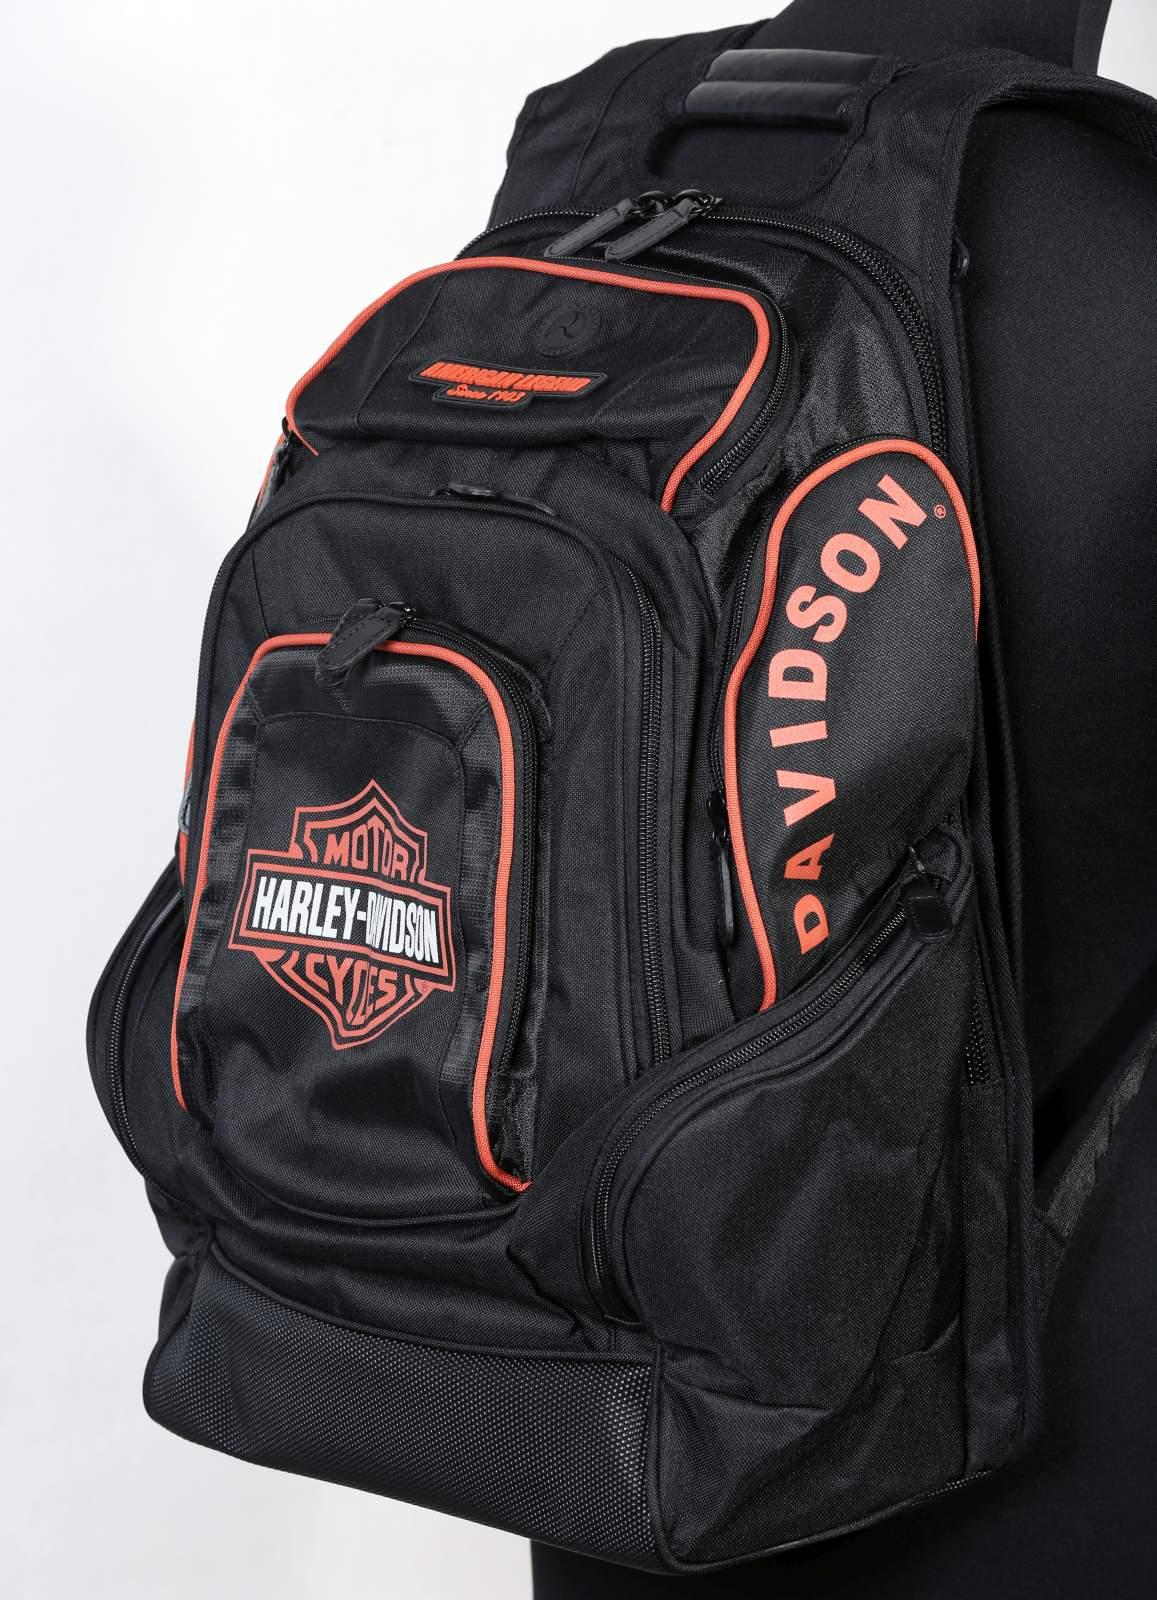 Harley-Davidson Backpack Black Willie G Skull Delux